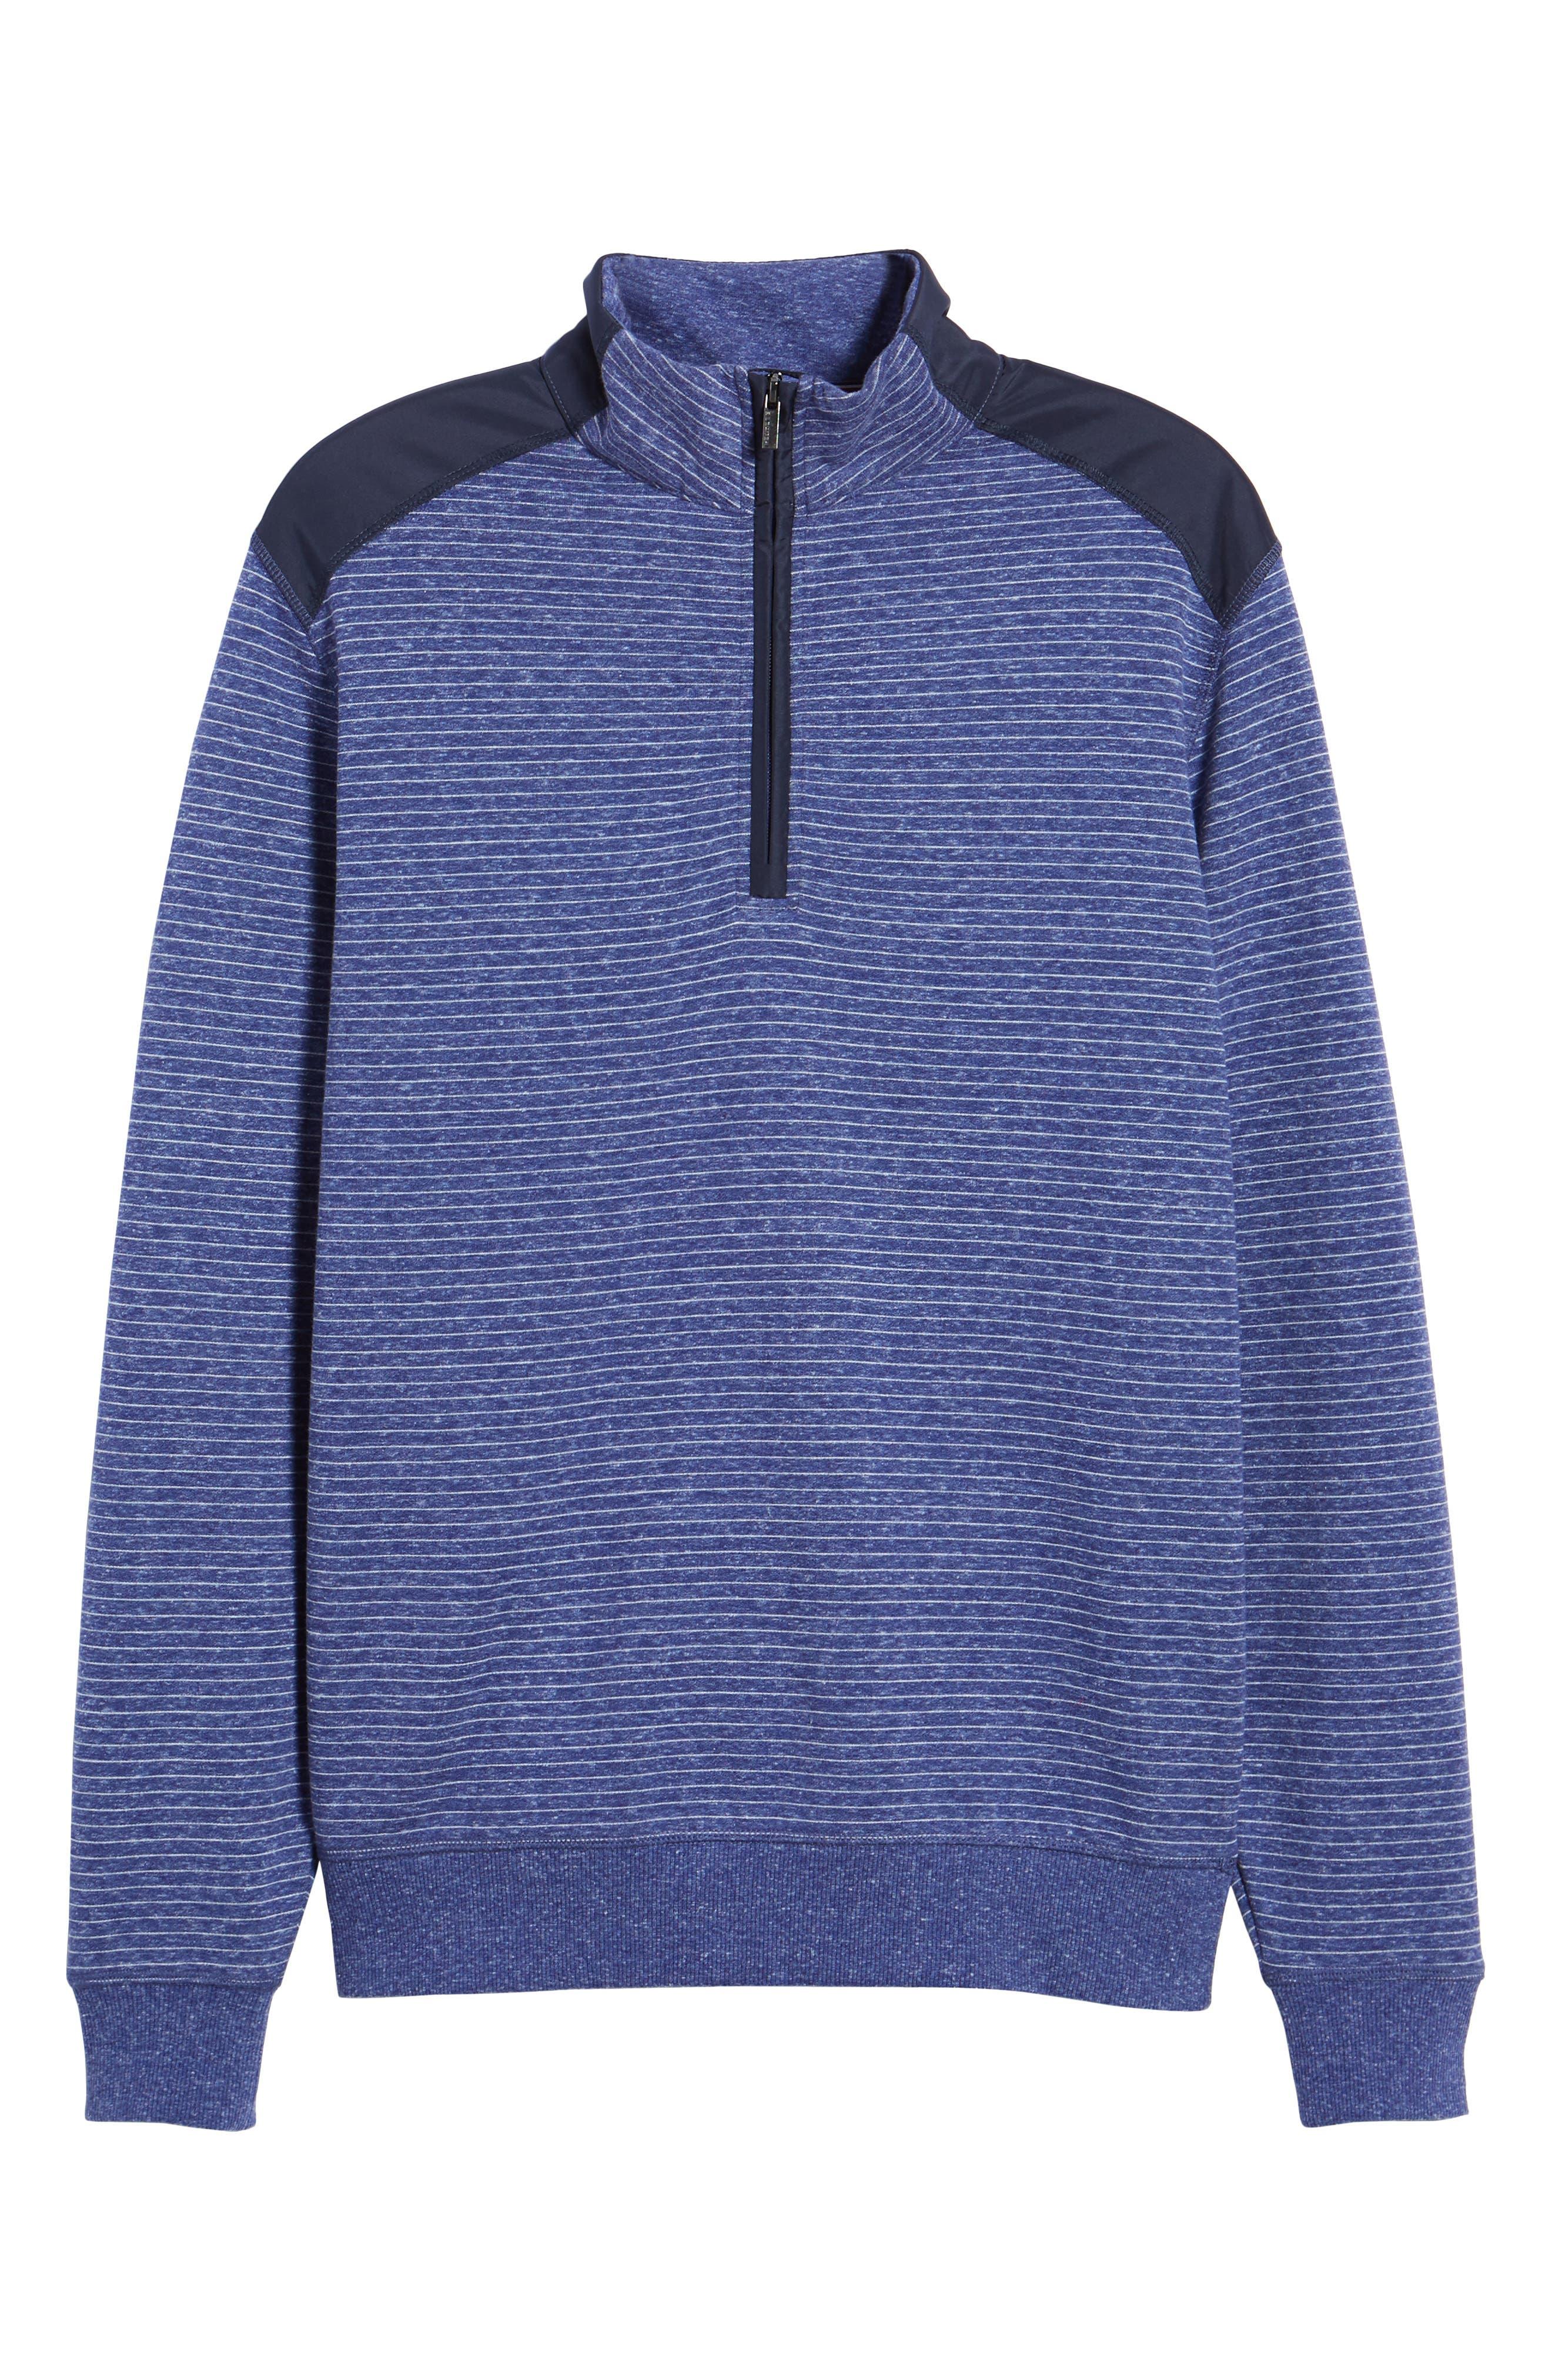 Regular Fit Stripe Quarter Zip Pullover,                             Alternate thumbnail 6, color,                             Night Blue